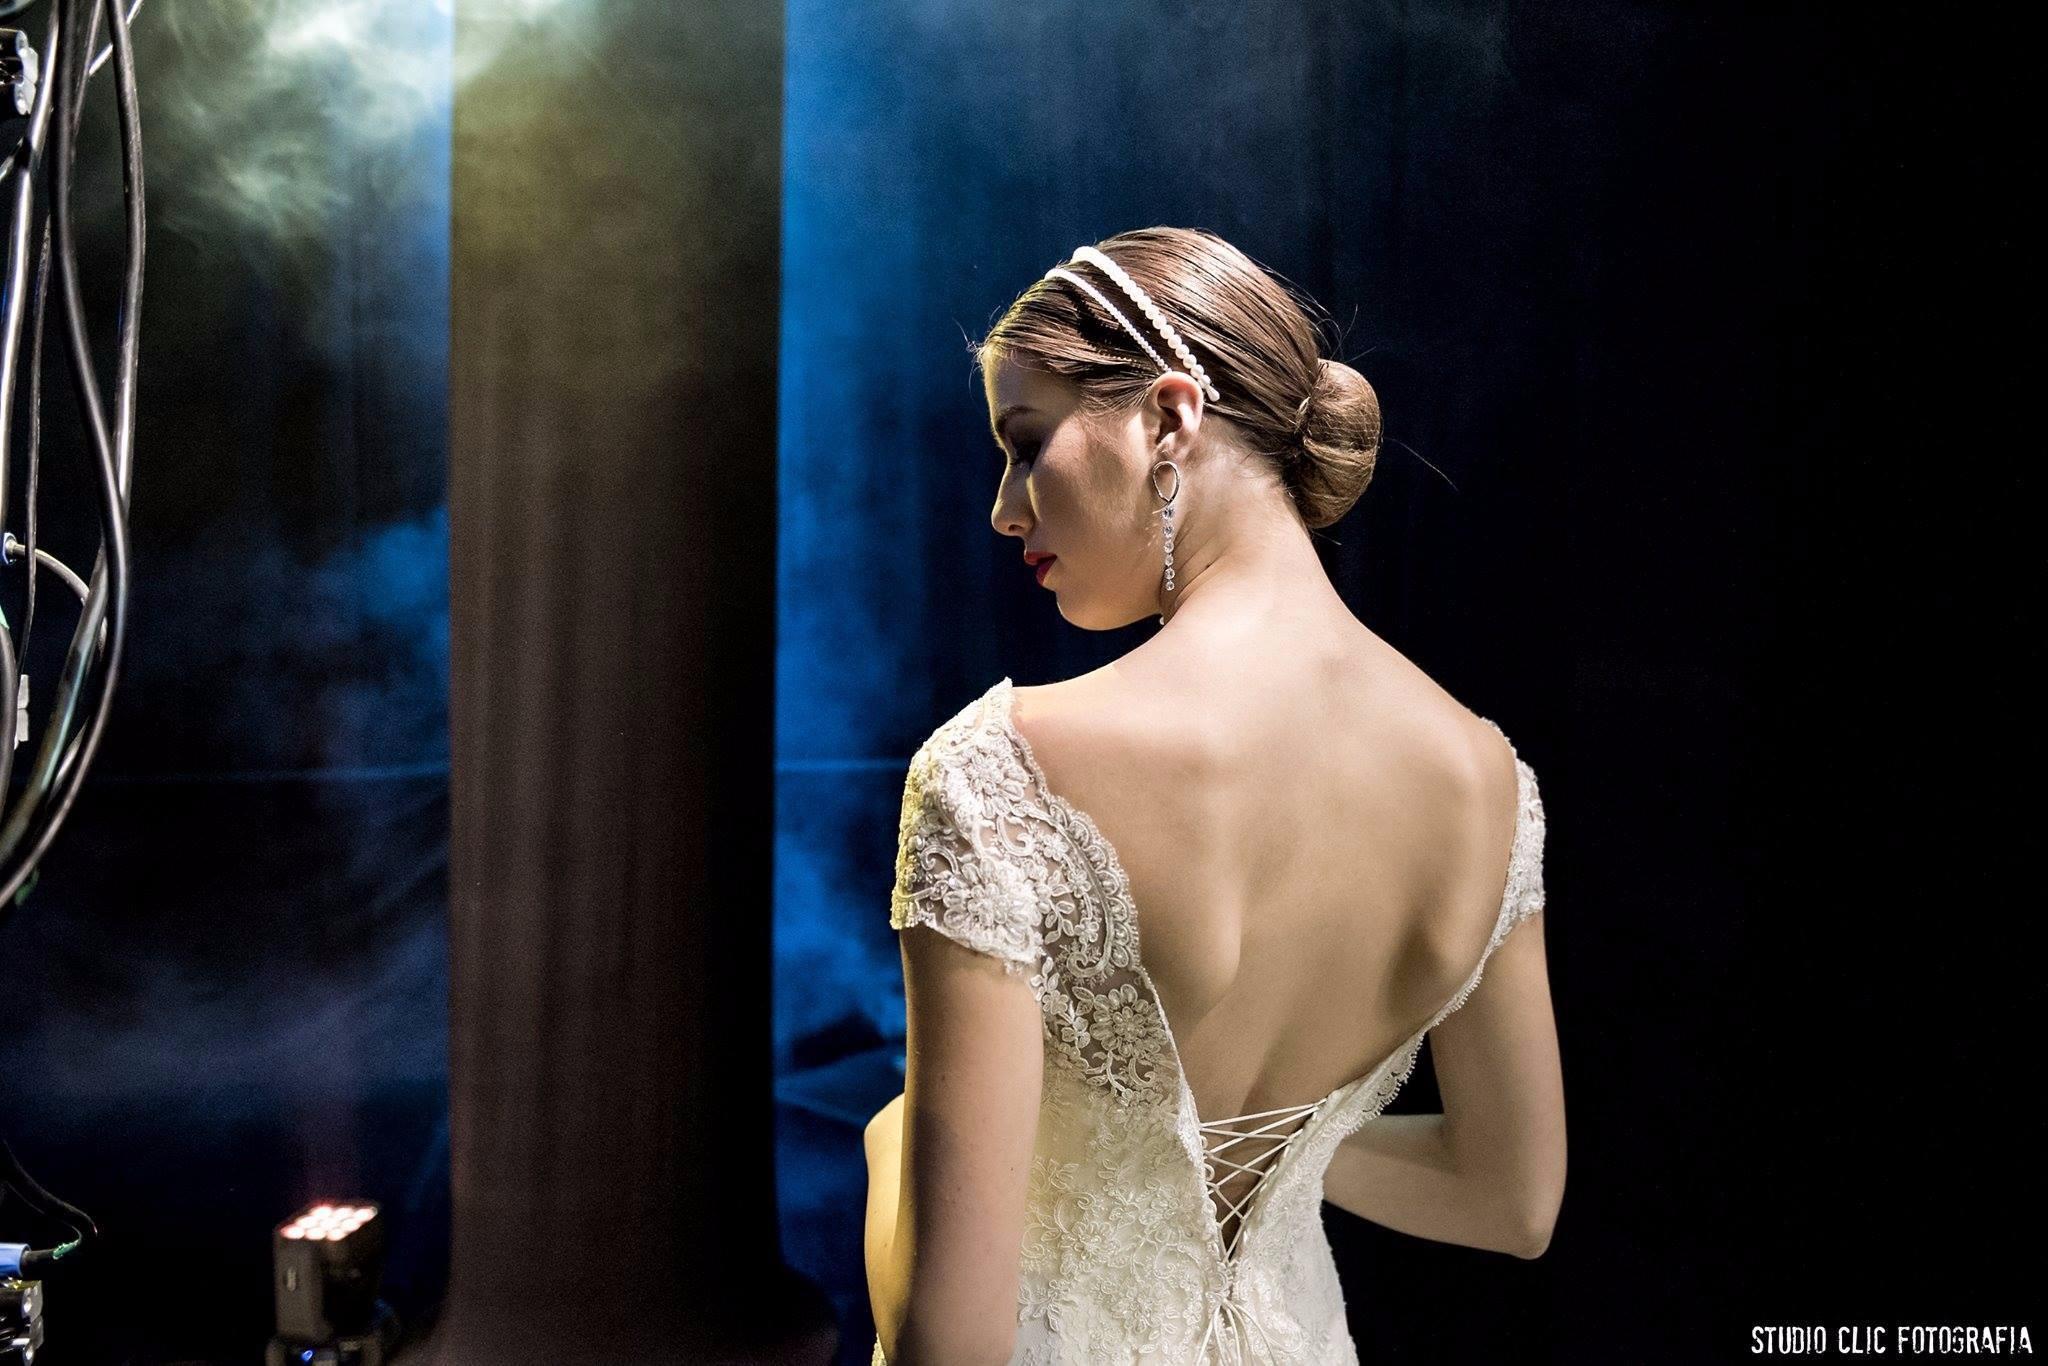 abiti da sposa schiena scoperta